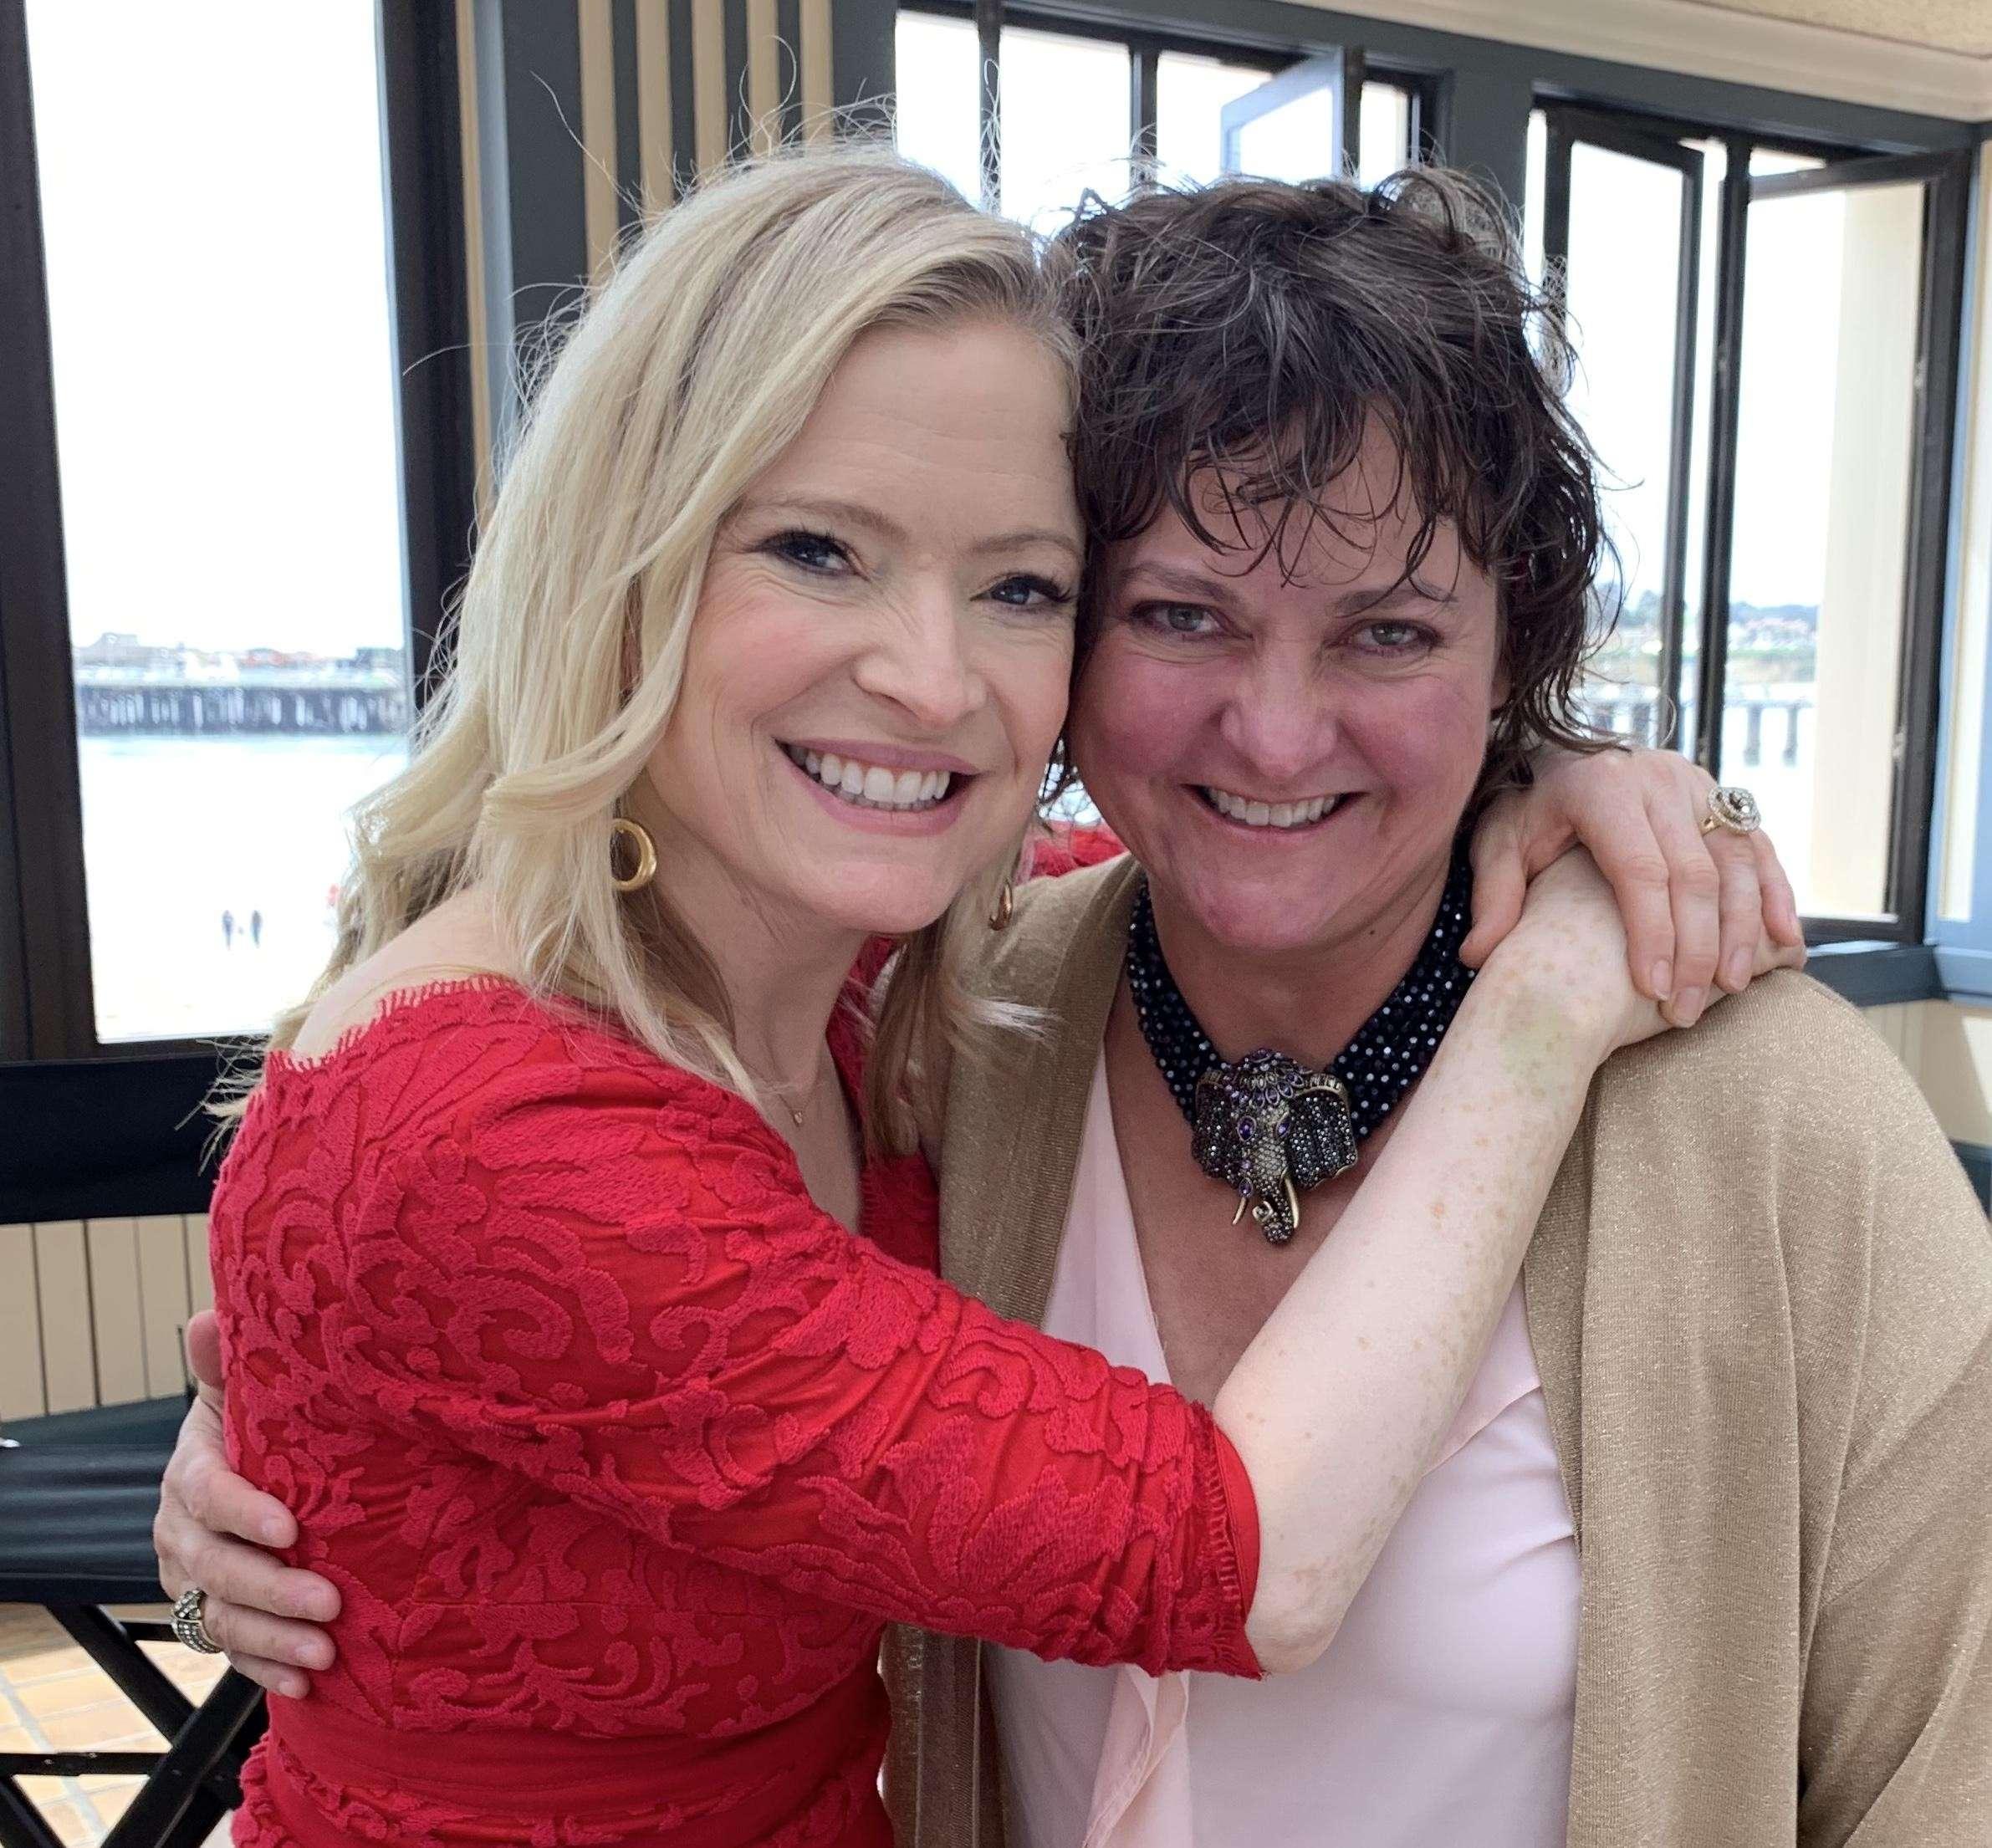 With Rikka Zimmerman